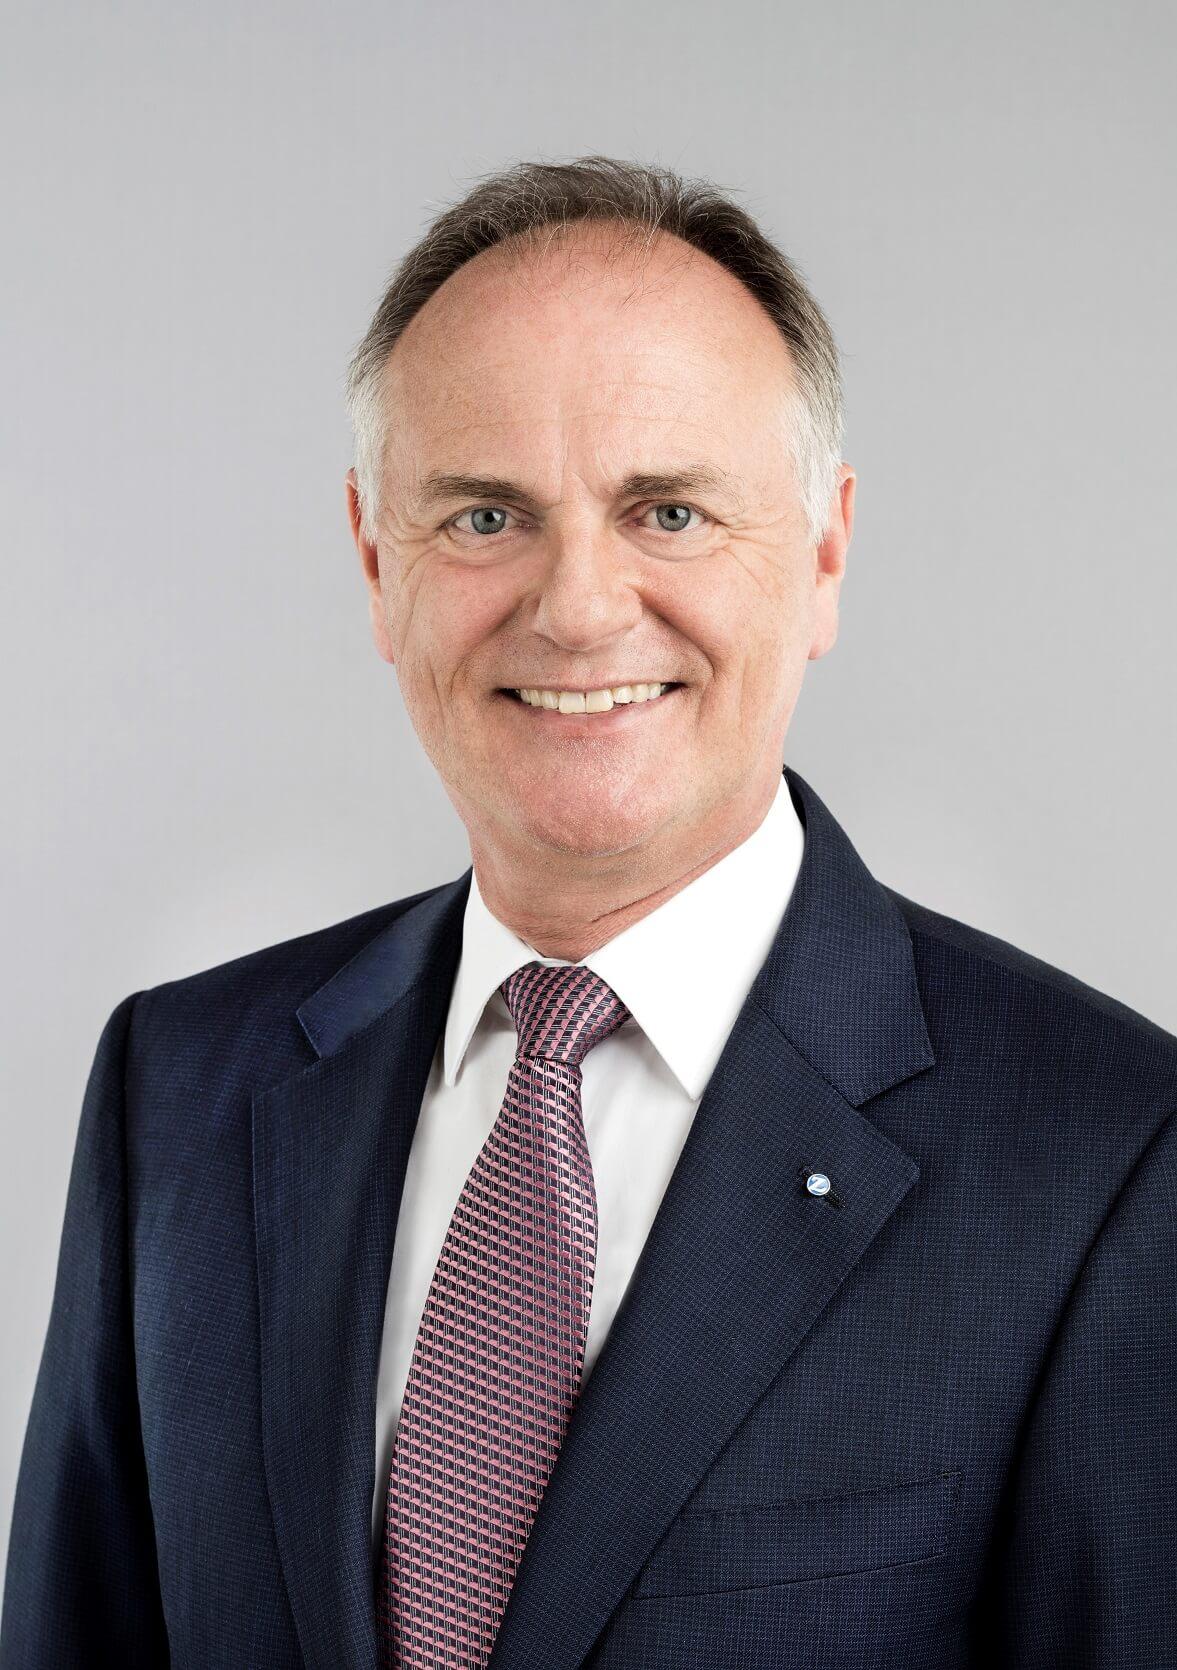 Dr. Gerhard Matschnig